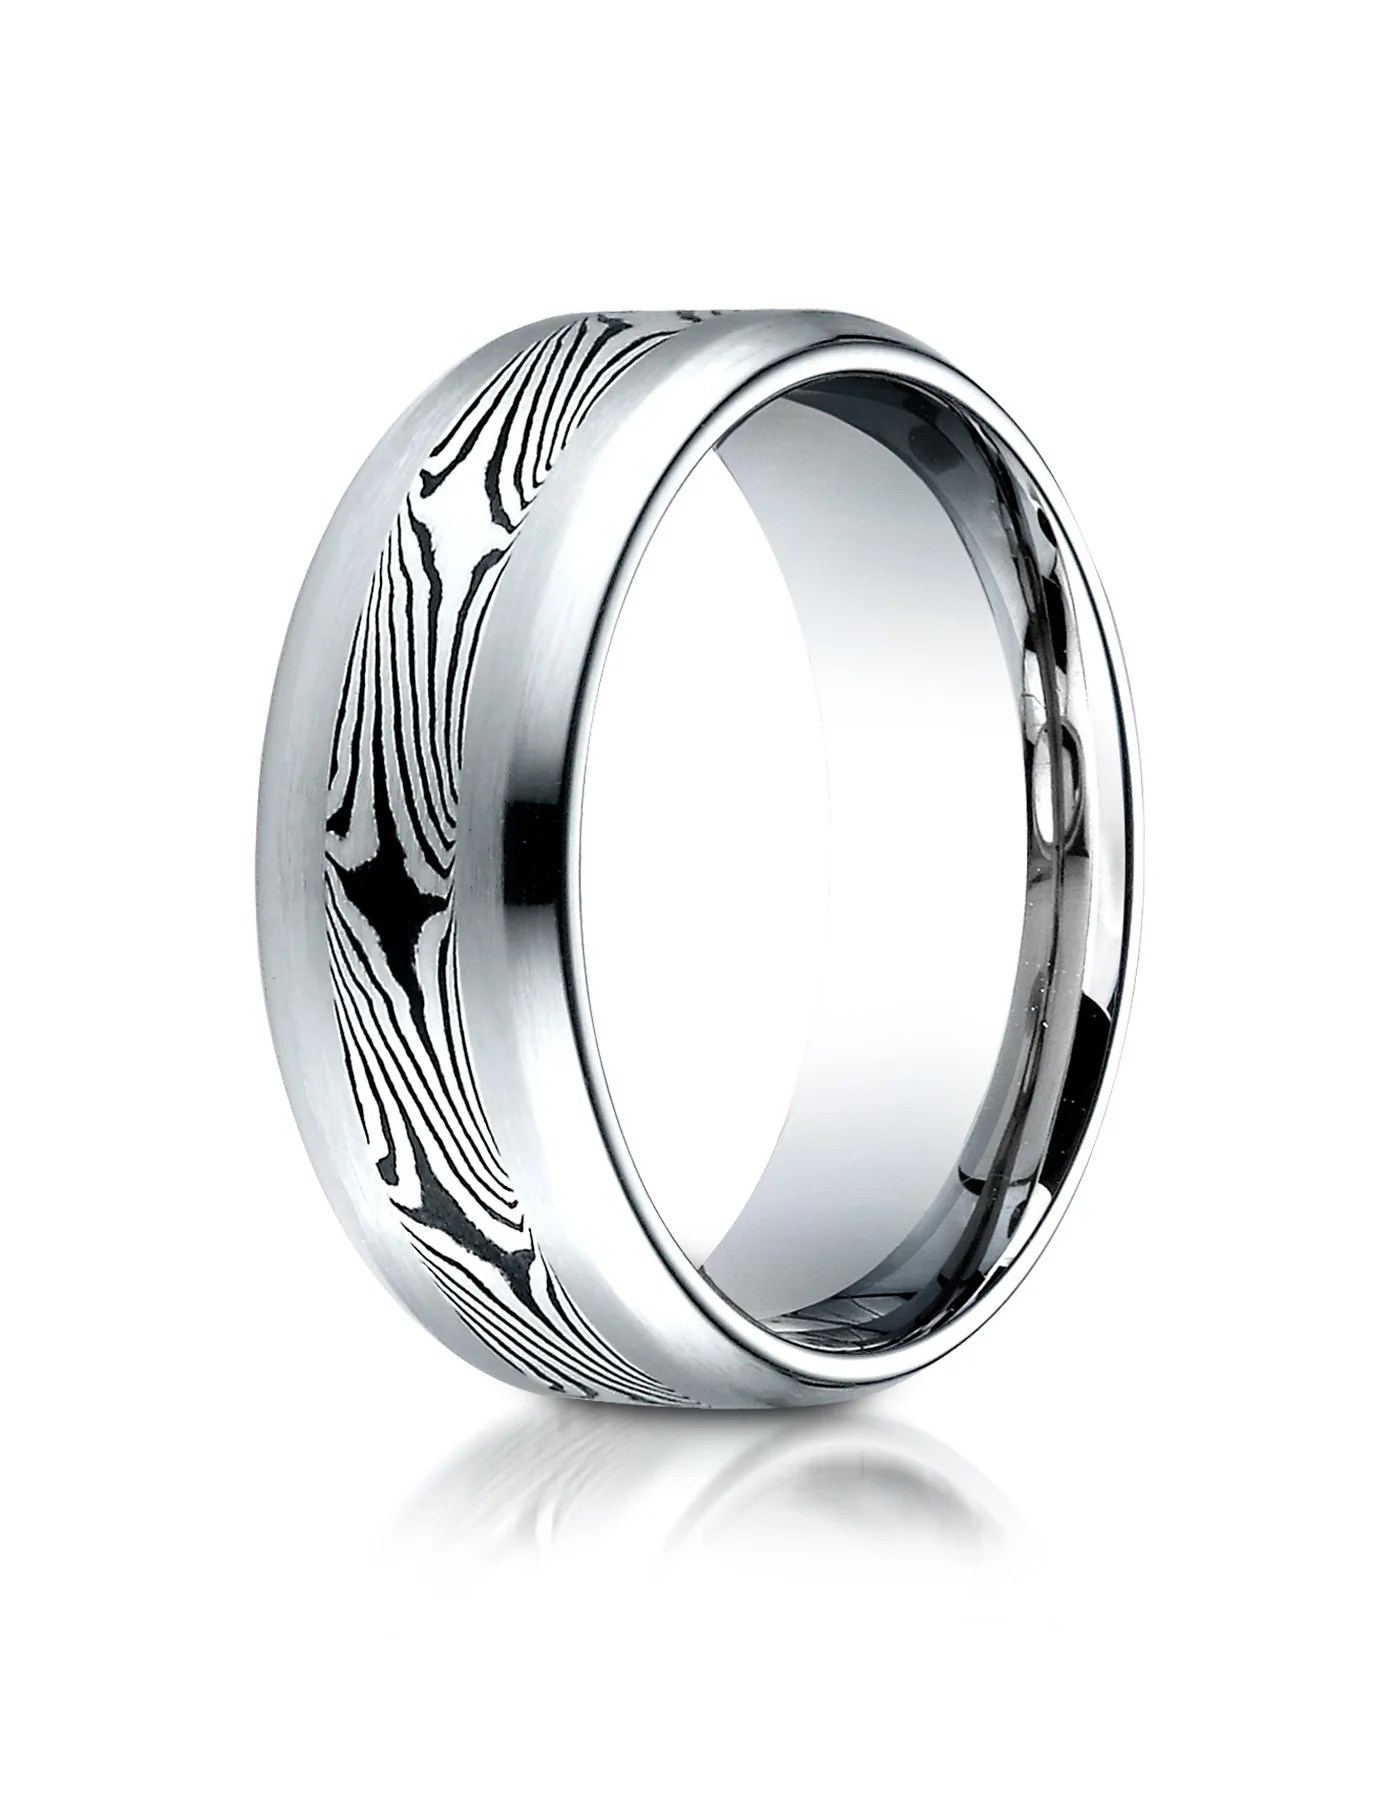 cuneo cobalt mokume wedding band for men by benchmark cobalt wedding rings CUNEO Cobalt Mokume Wedding Band for Men by Benchmark